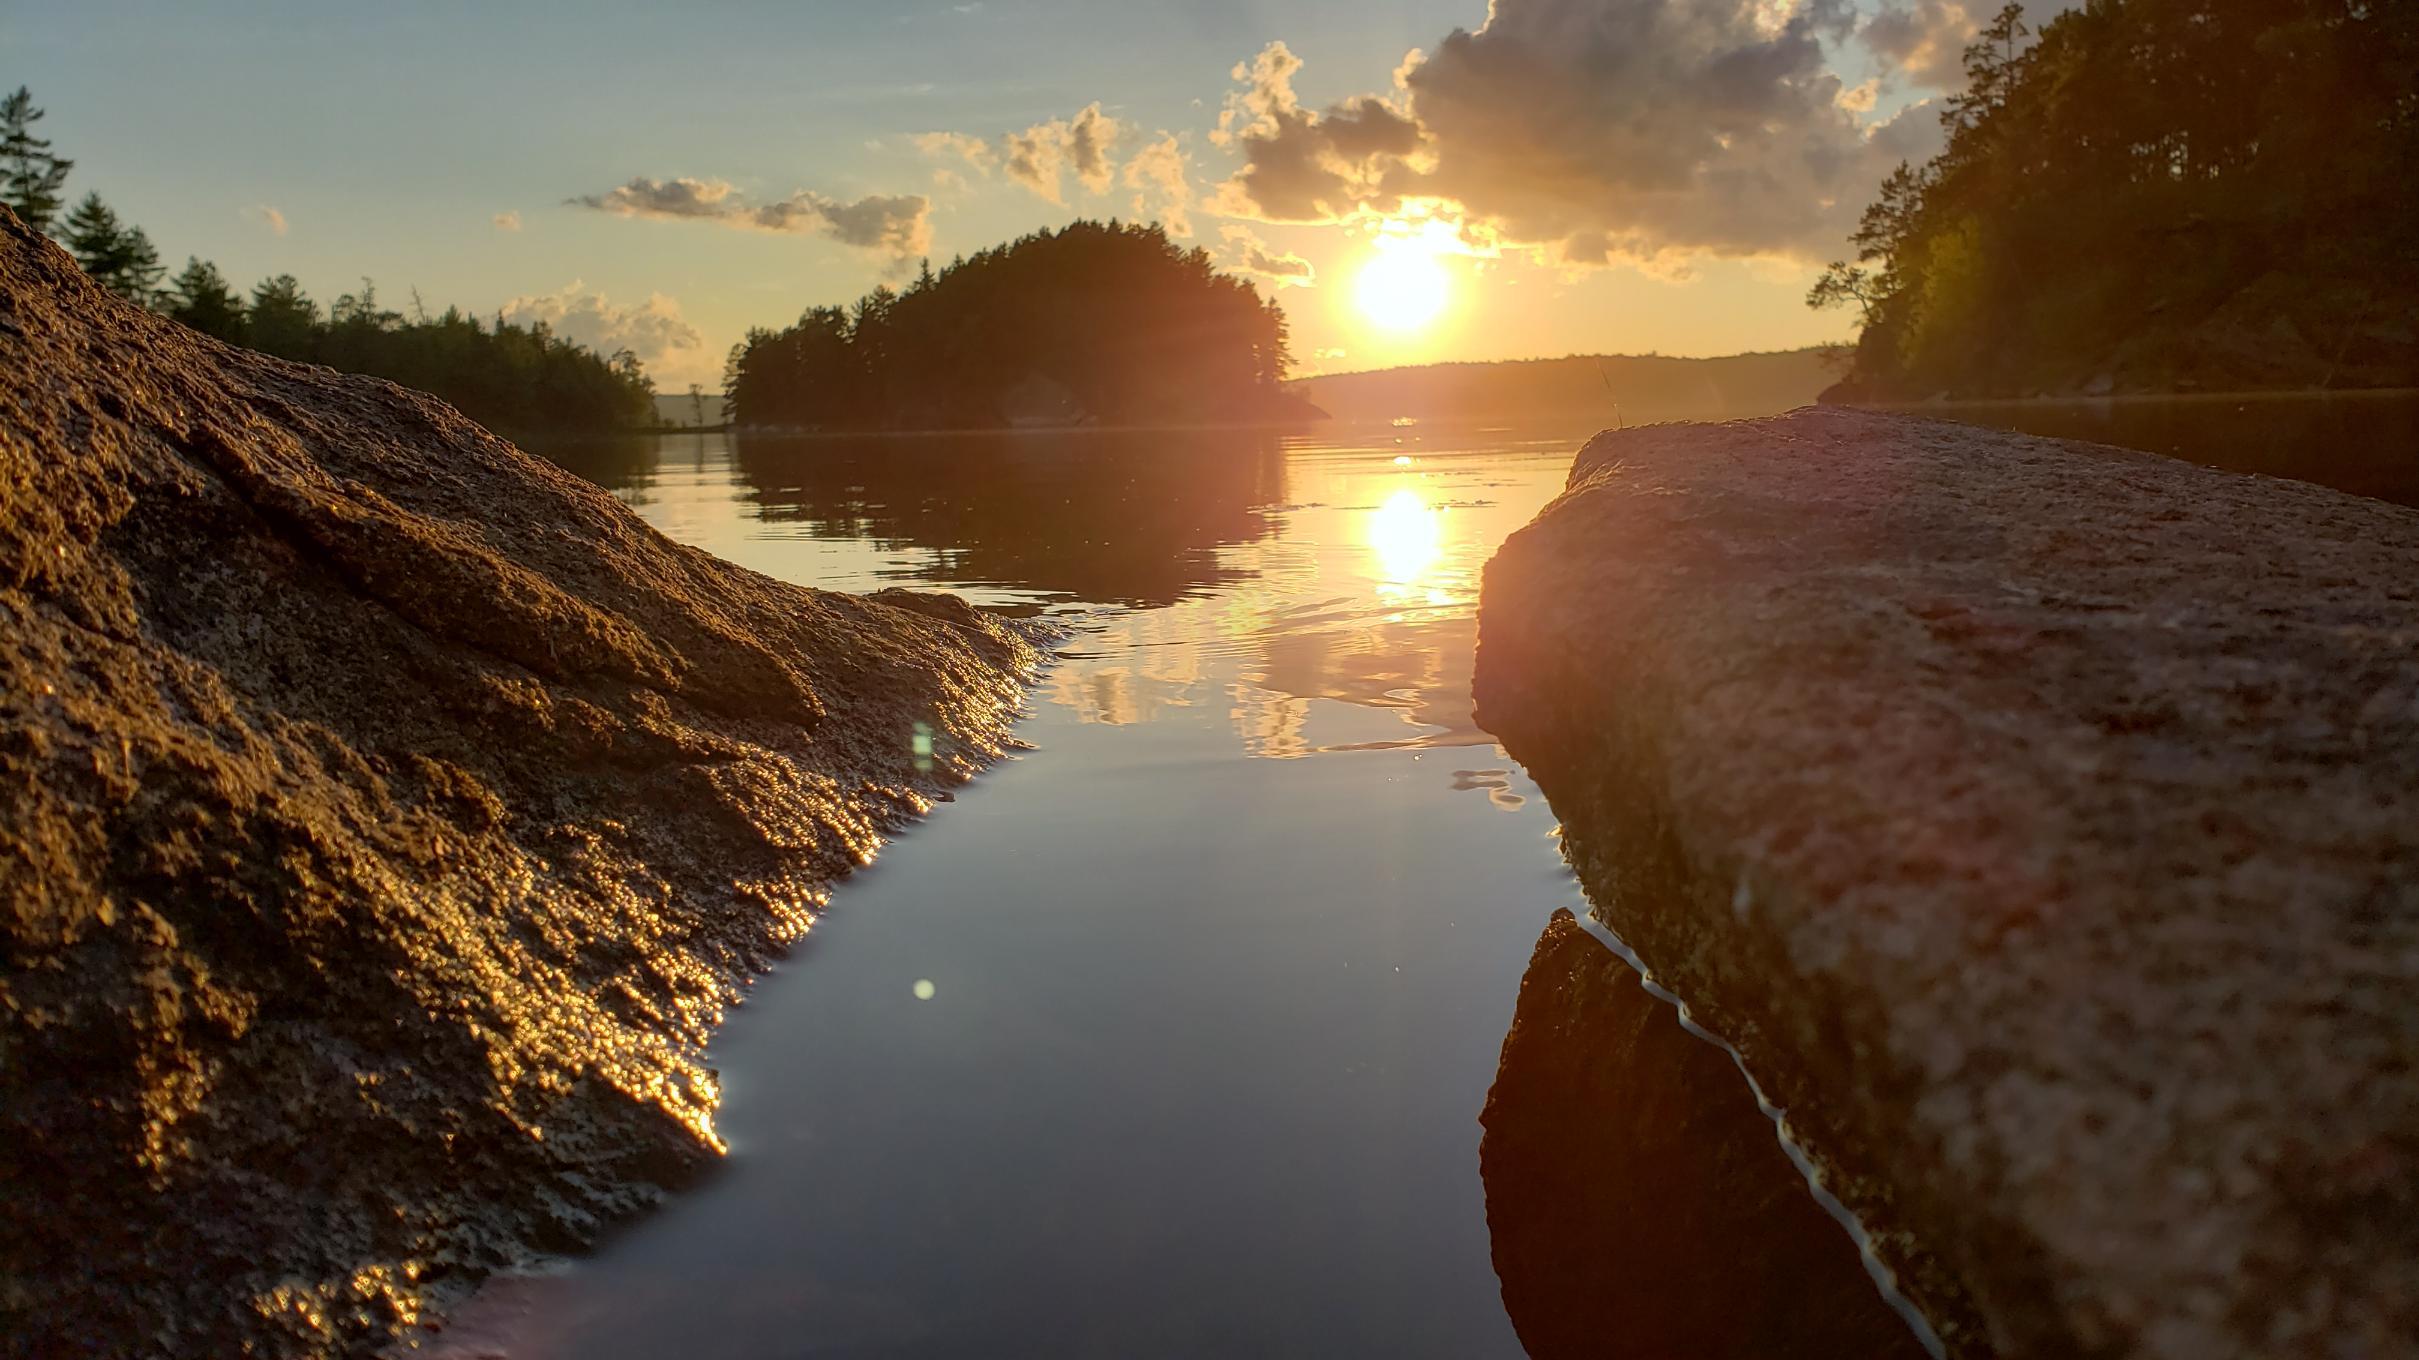 Sunset on Lac La Croix 2019